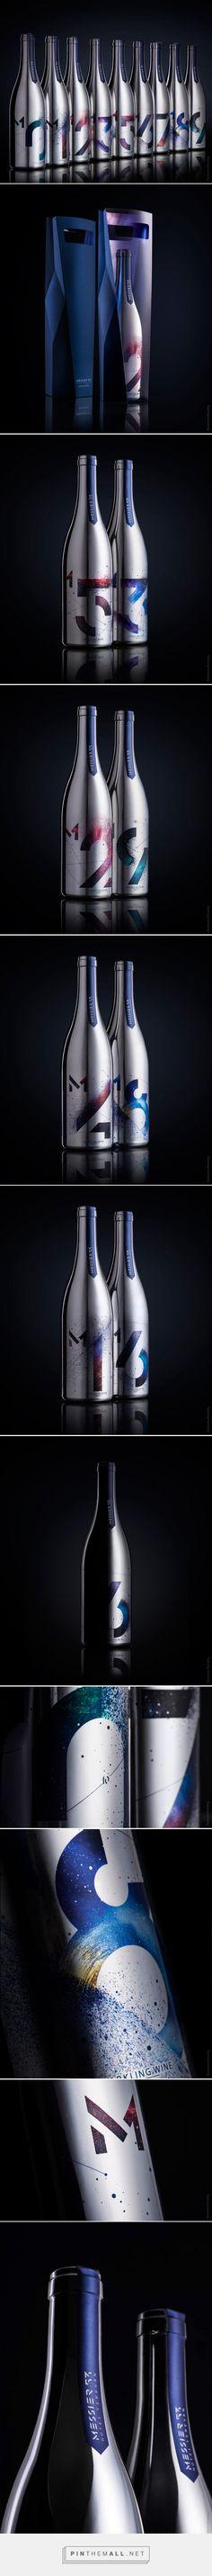 Messier 53 Wine packaging design by Backbone Branding - https://www.packagingoftheworld.com/2018/07/messier-53-wine.html